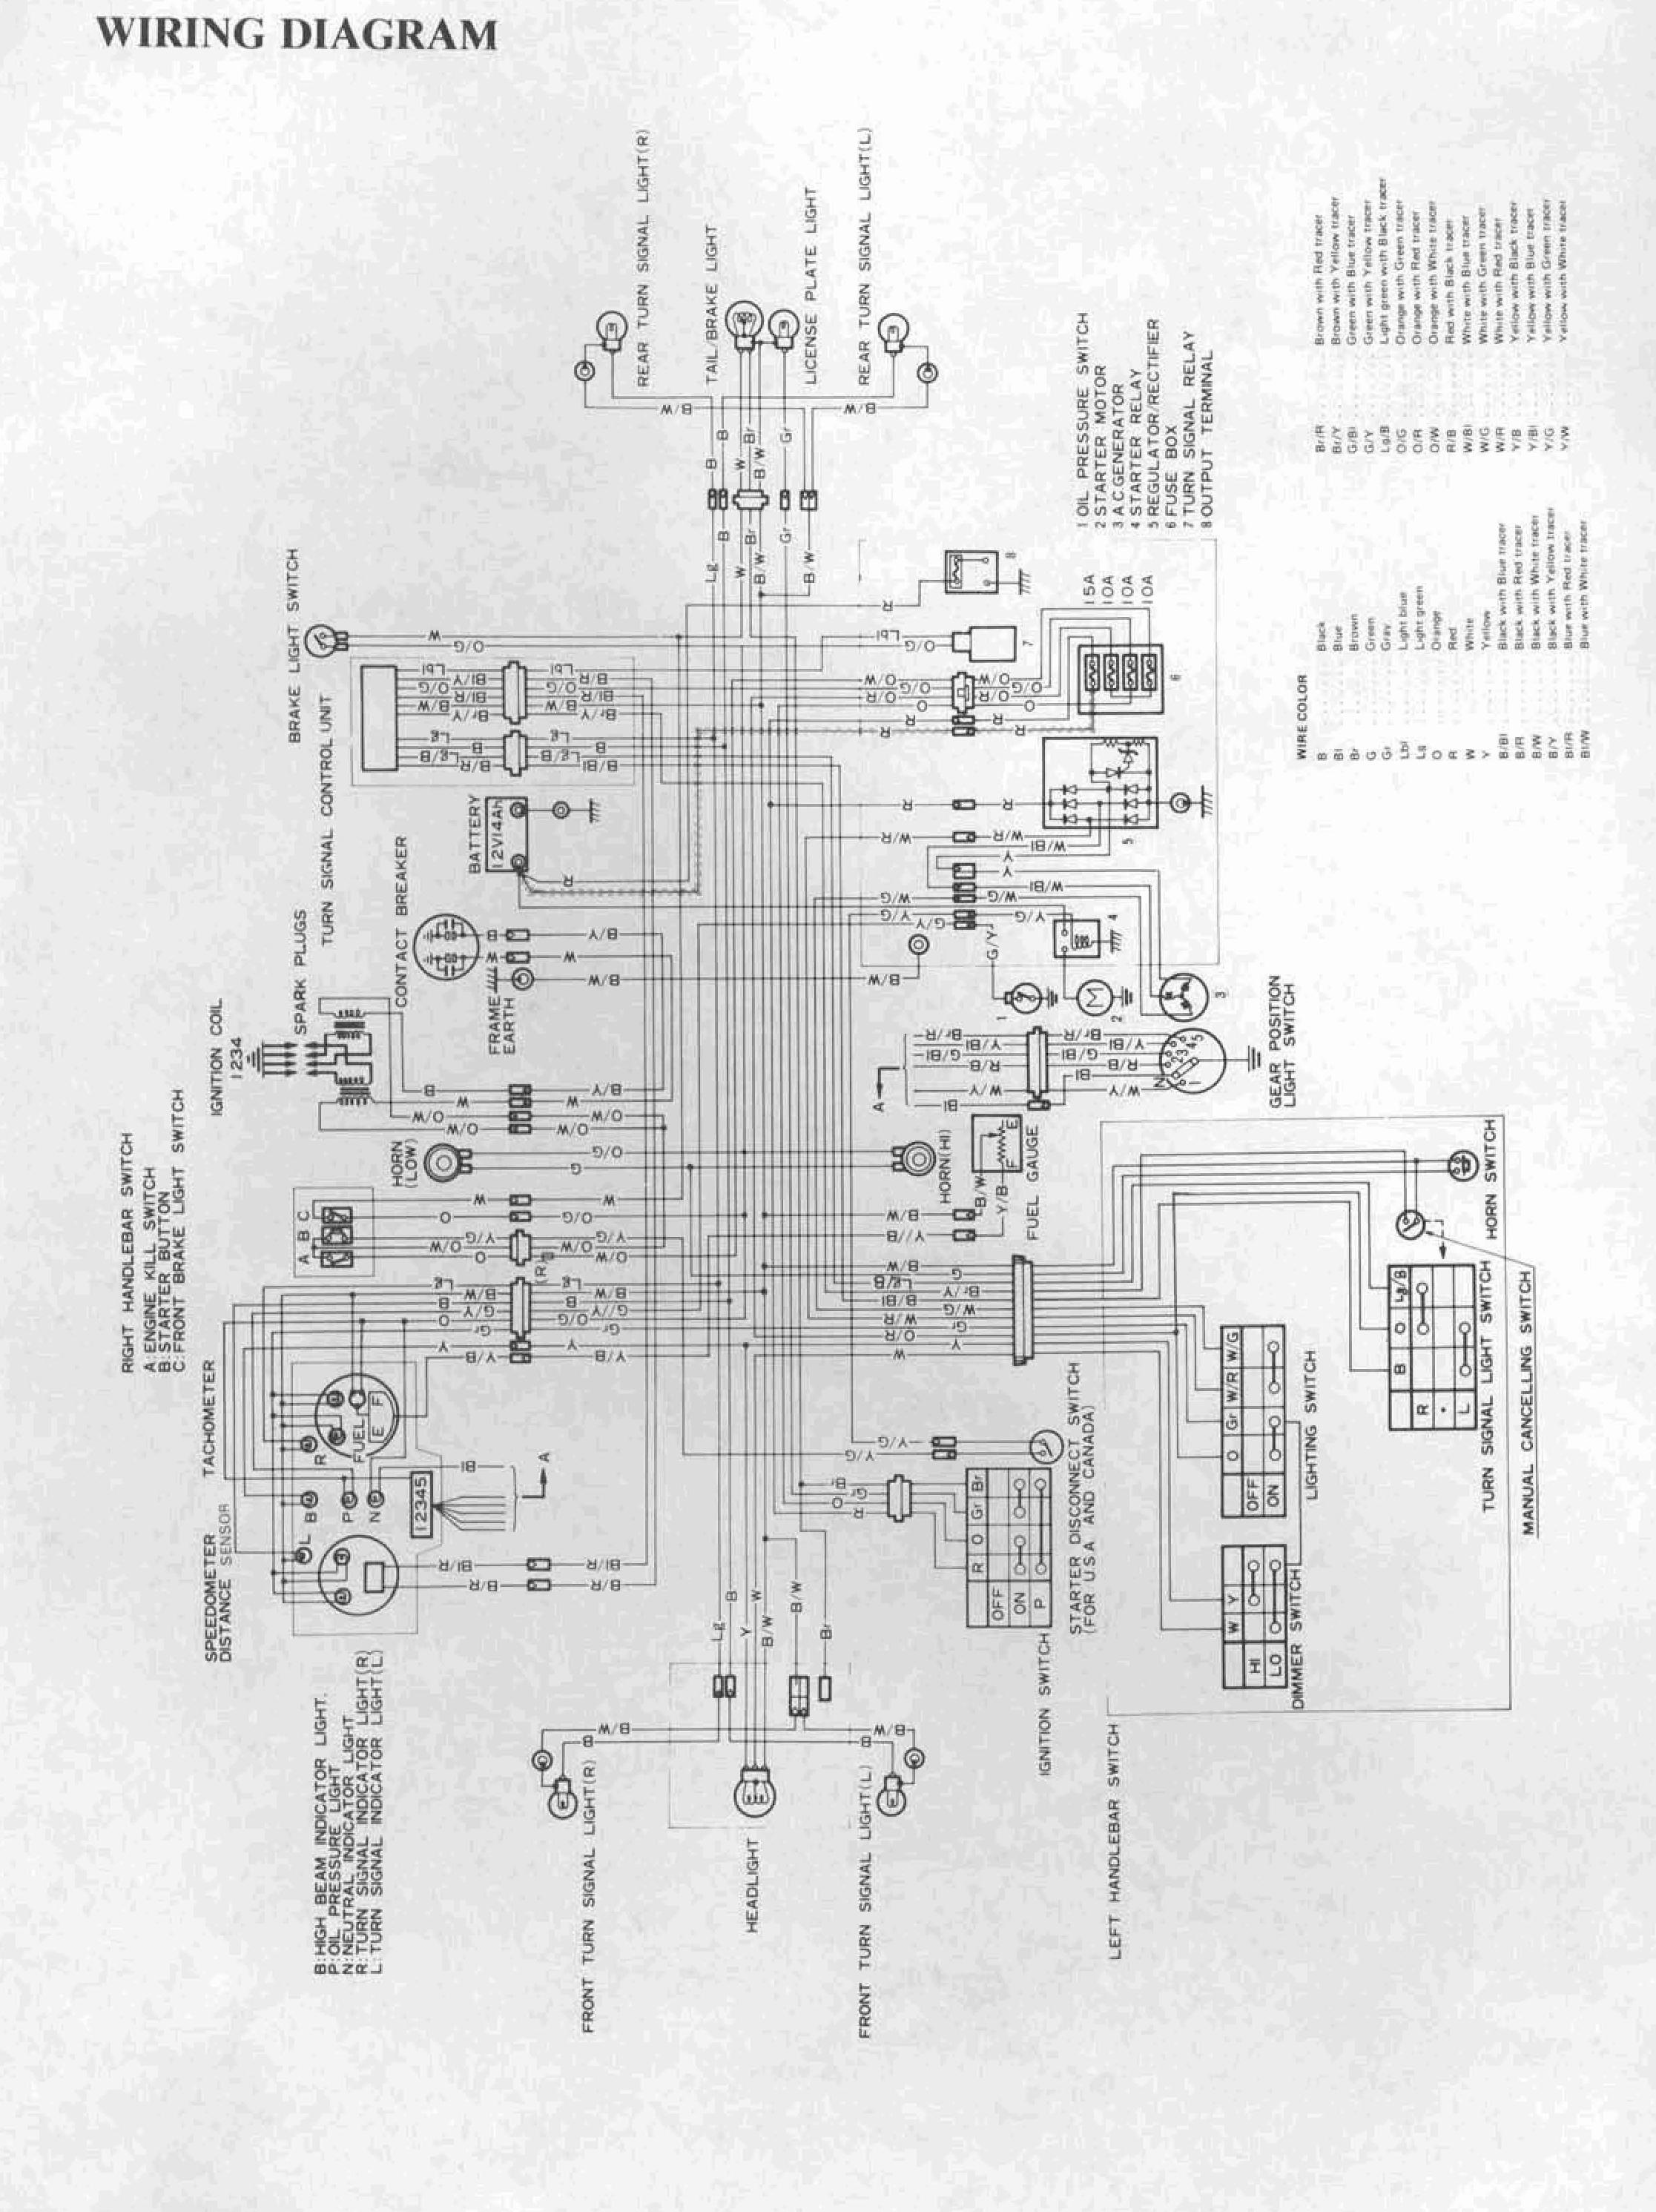 Awe Inspiring 1979 Suzuki Gs850 Wiring Diagram Wiring Diagram A6 Wiring 101 Kwecapipaaccommodationcom